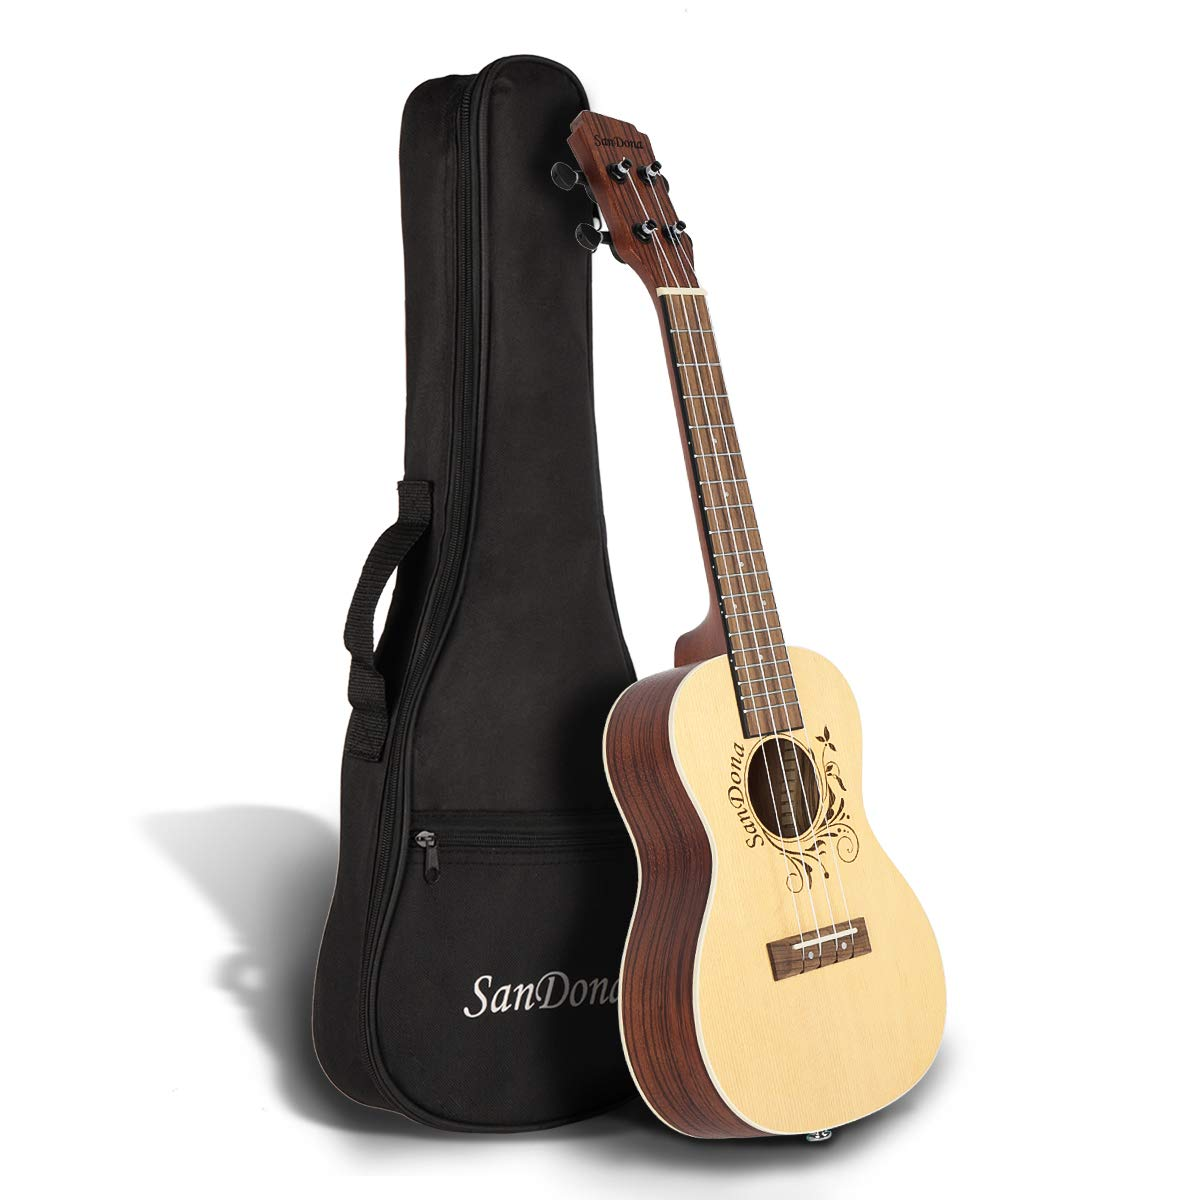 SANDONA Acoustic Electric Concert Ukulele EQ 24 Inch Kit eUKC-141 | Spruce Solid Wood | Under-Saddle Piezo Bridge Pickup, Strap, Aquila Strings, Digital Tuner and Gig bag (Latte)